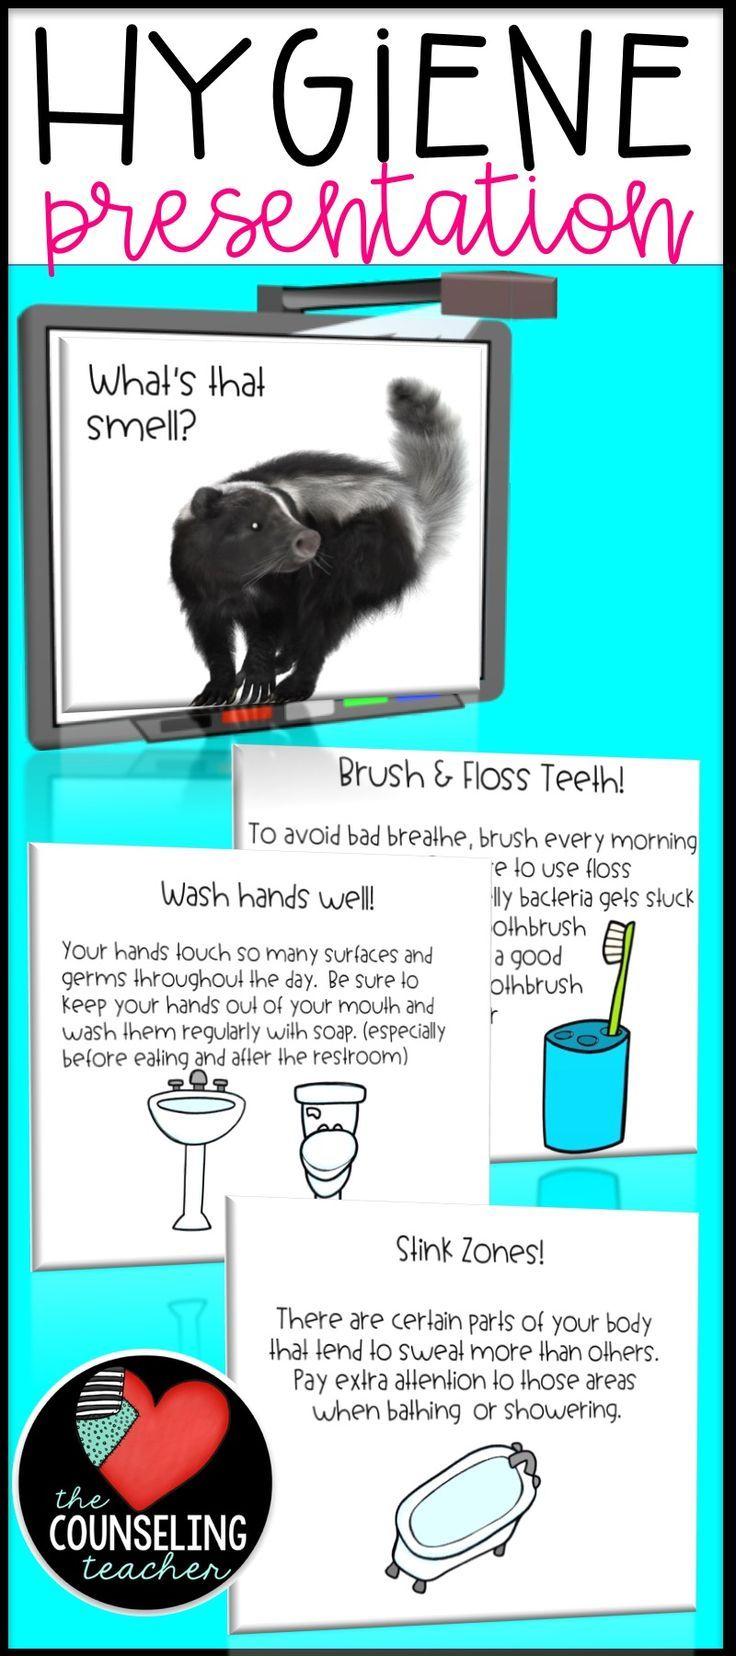 Personal Hygiene Presentation Hygiene lessons